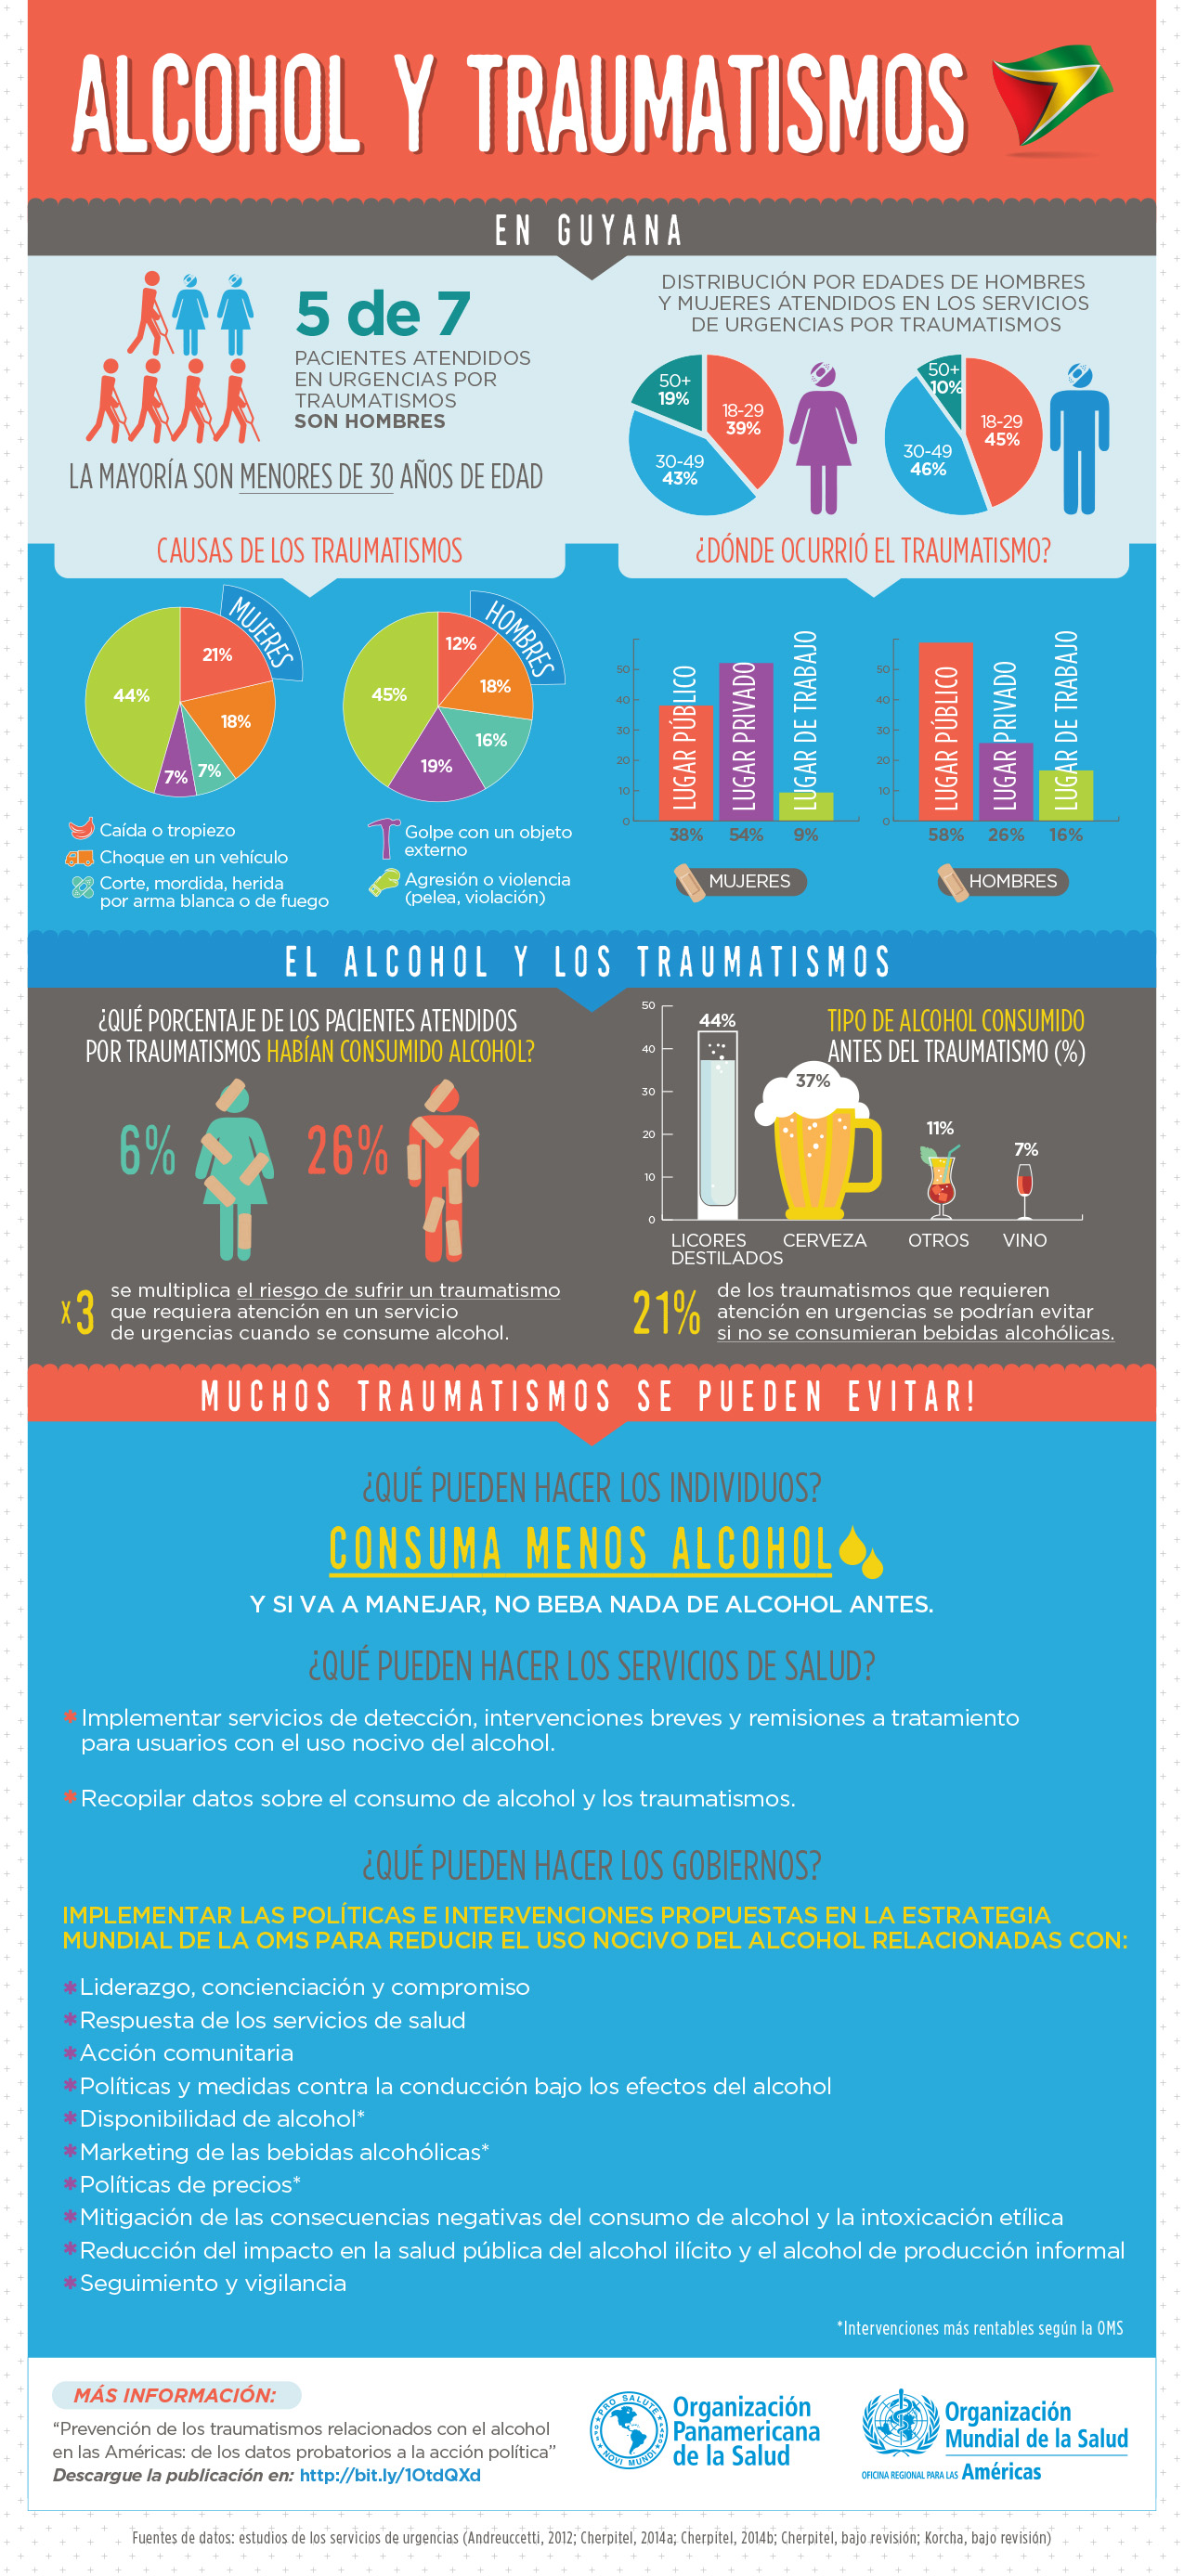 Alcohol y Traumatismos infographic PAHO Guyana.jpg